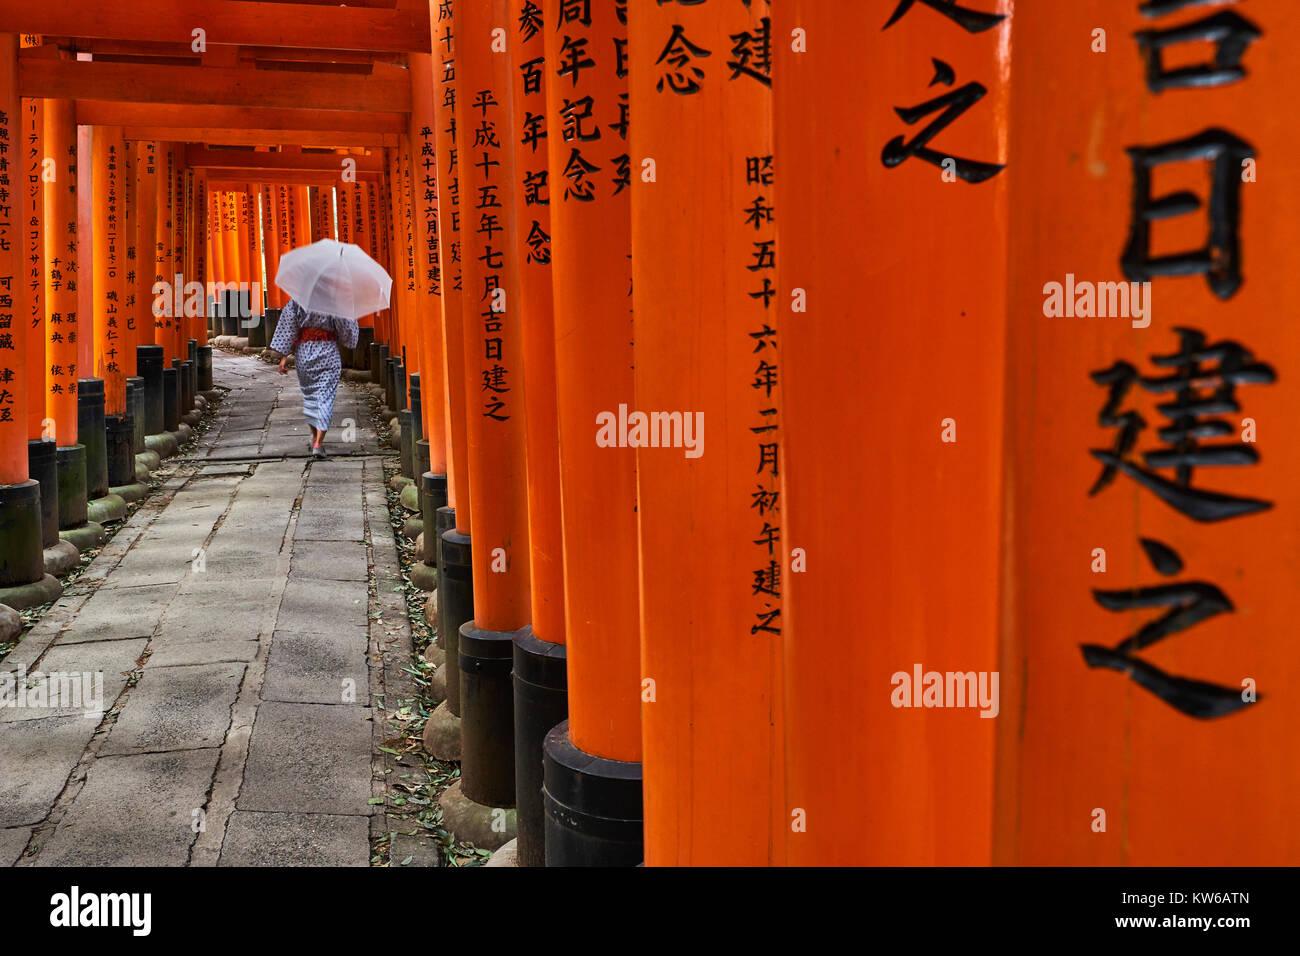 Japan, Honshu Island, Region Kansai, Kyoto, Arashiyama, Fushimi Inari-taisha Tempel und Shint?-Heiligtum, torii Stockbild